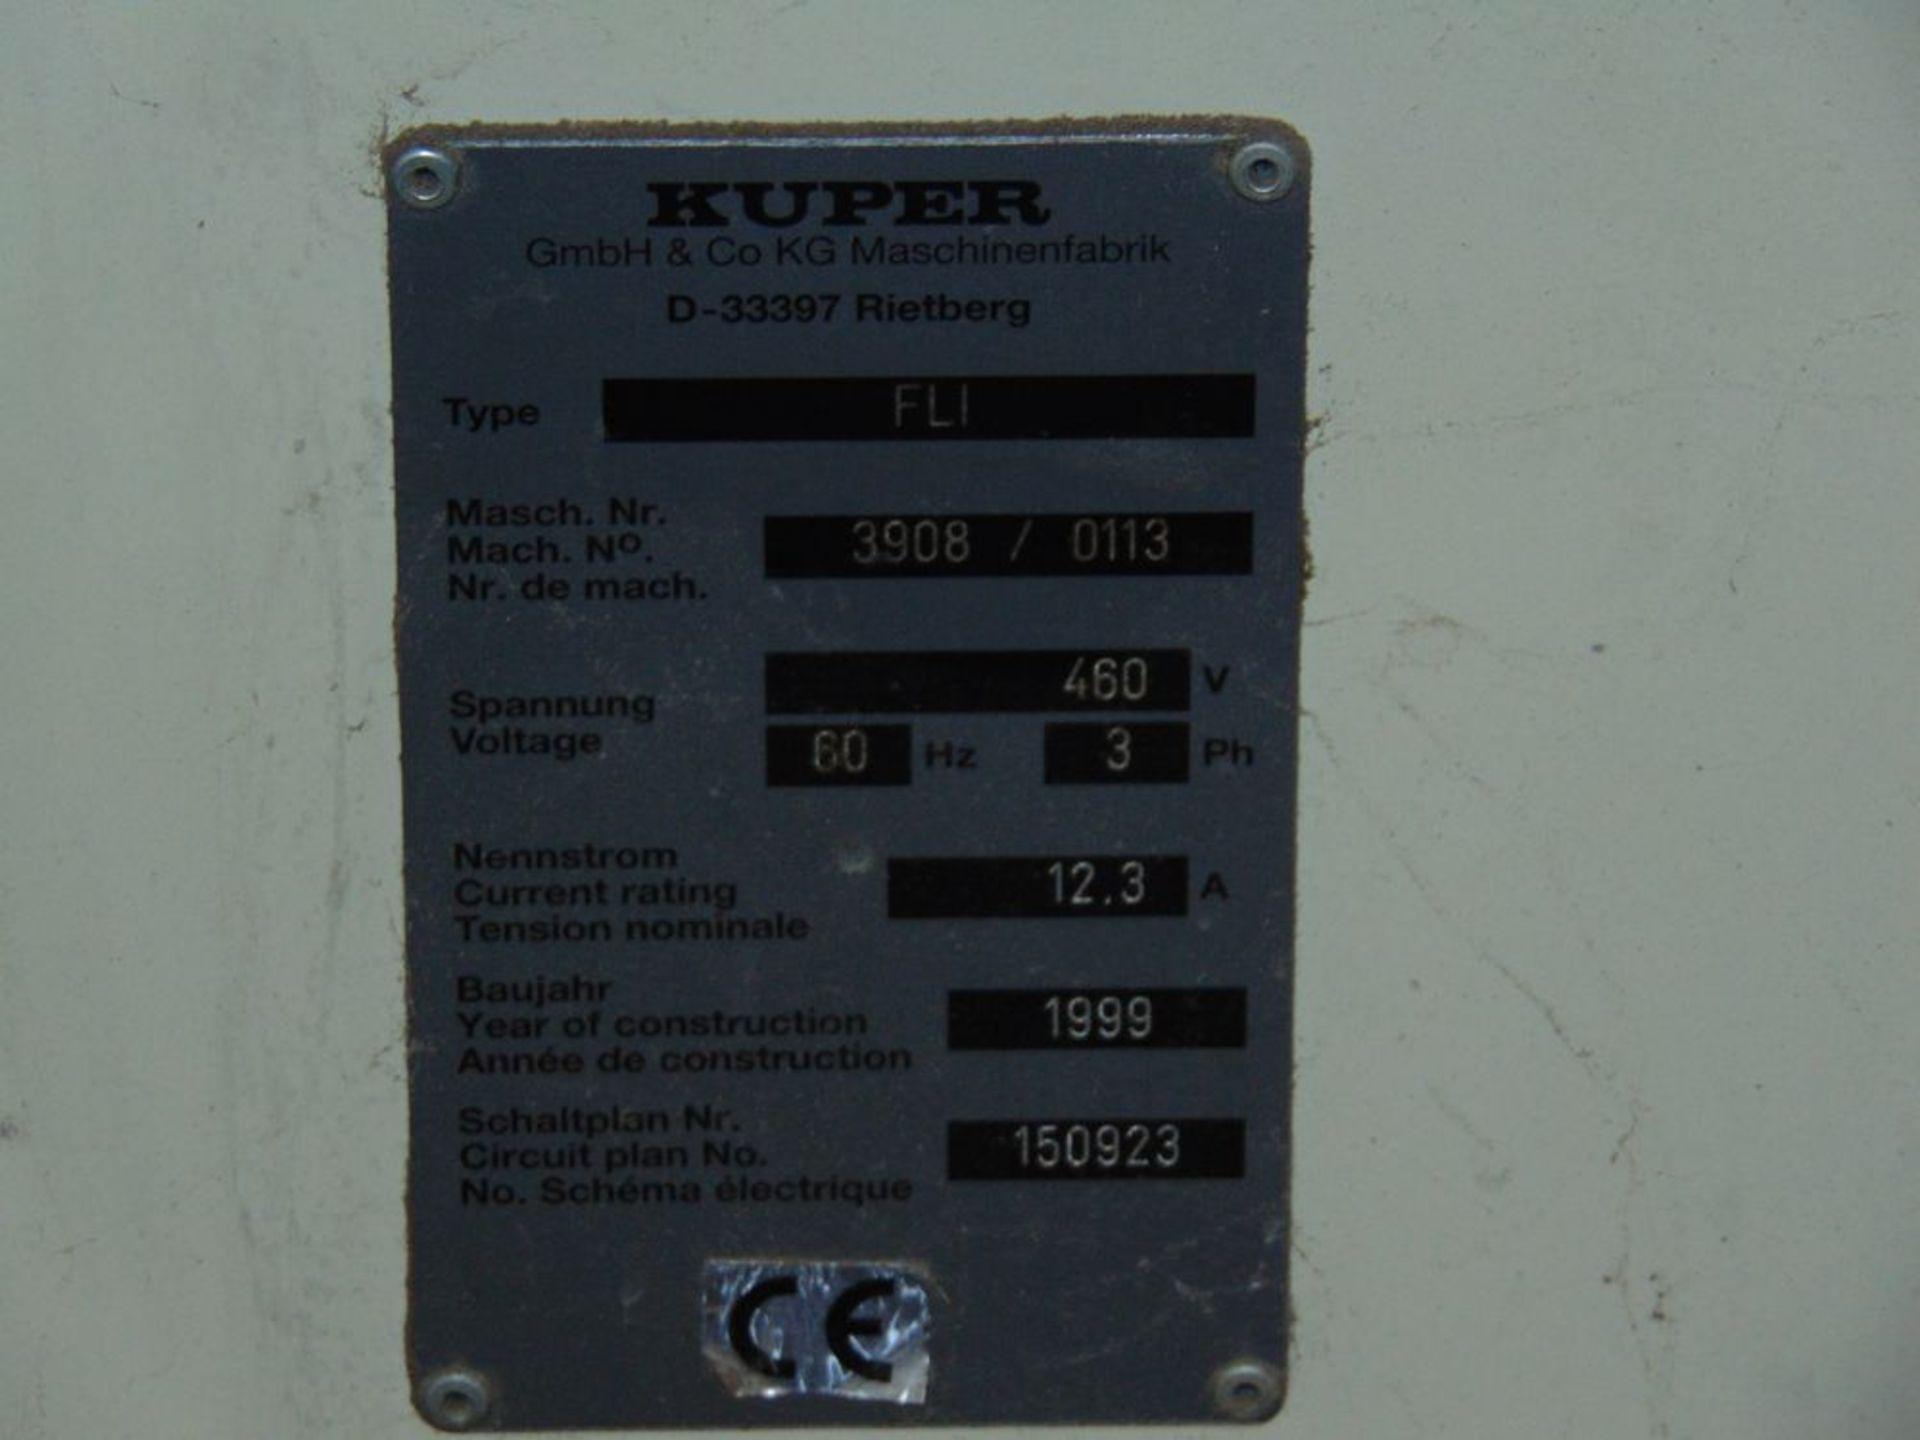 (1999) Kuper Type FCI Mach. No. 3908/0113 Veneer Splicing Machine w/ 54'' x 102''L Light Table; S/ - Image 7 of 7